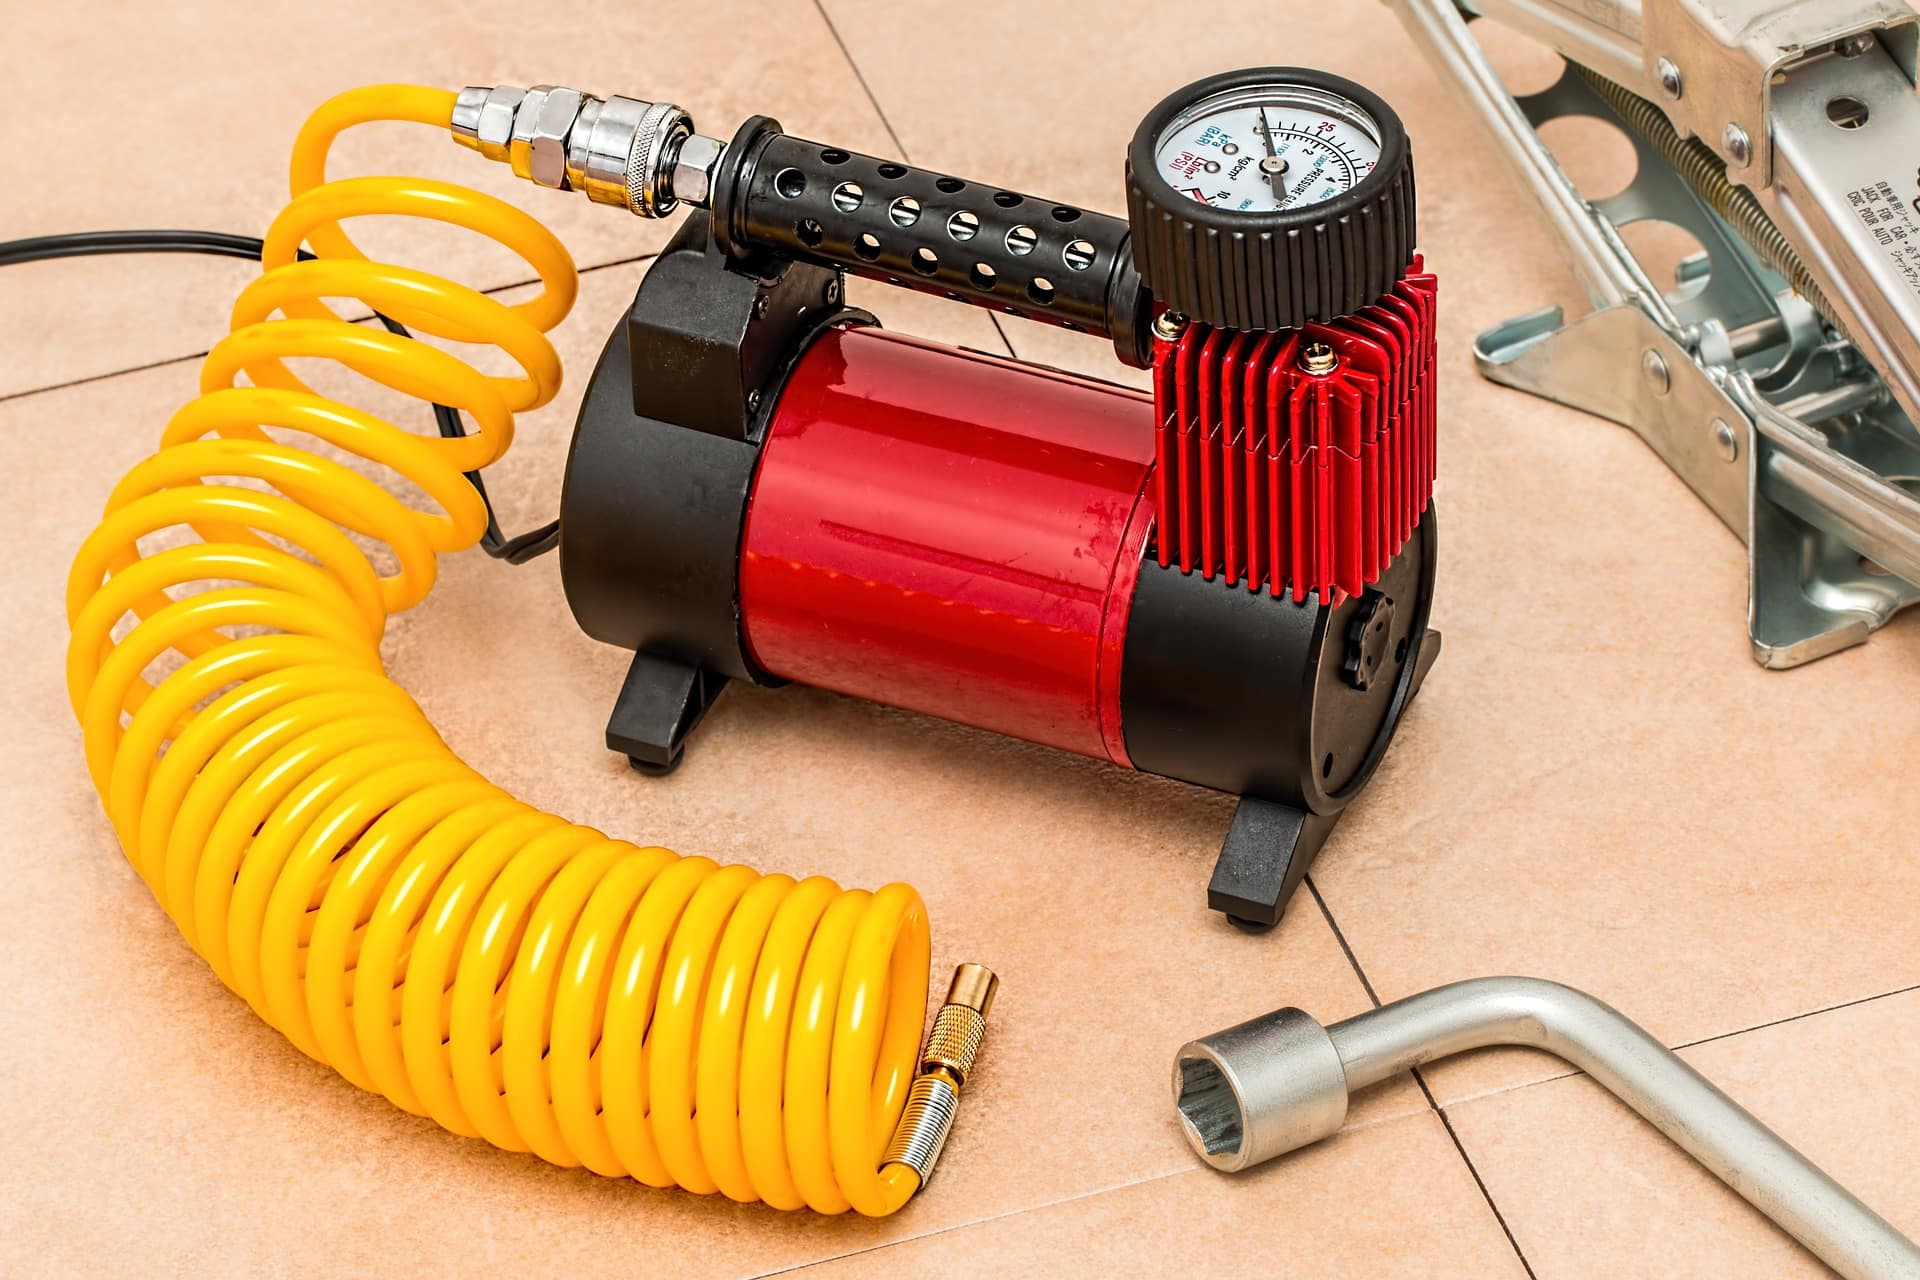 kertportal-btk-kep1-akulonfelekompresszorokmas-masteruletekenalkalmazhatok